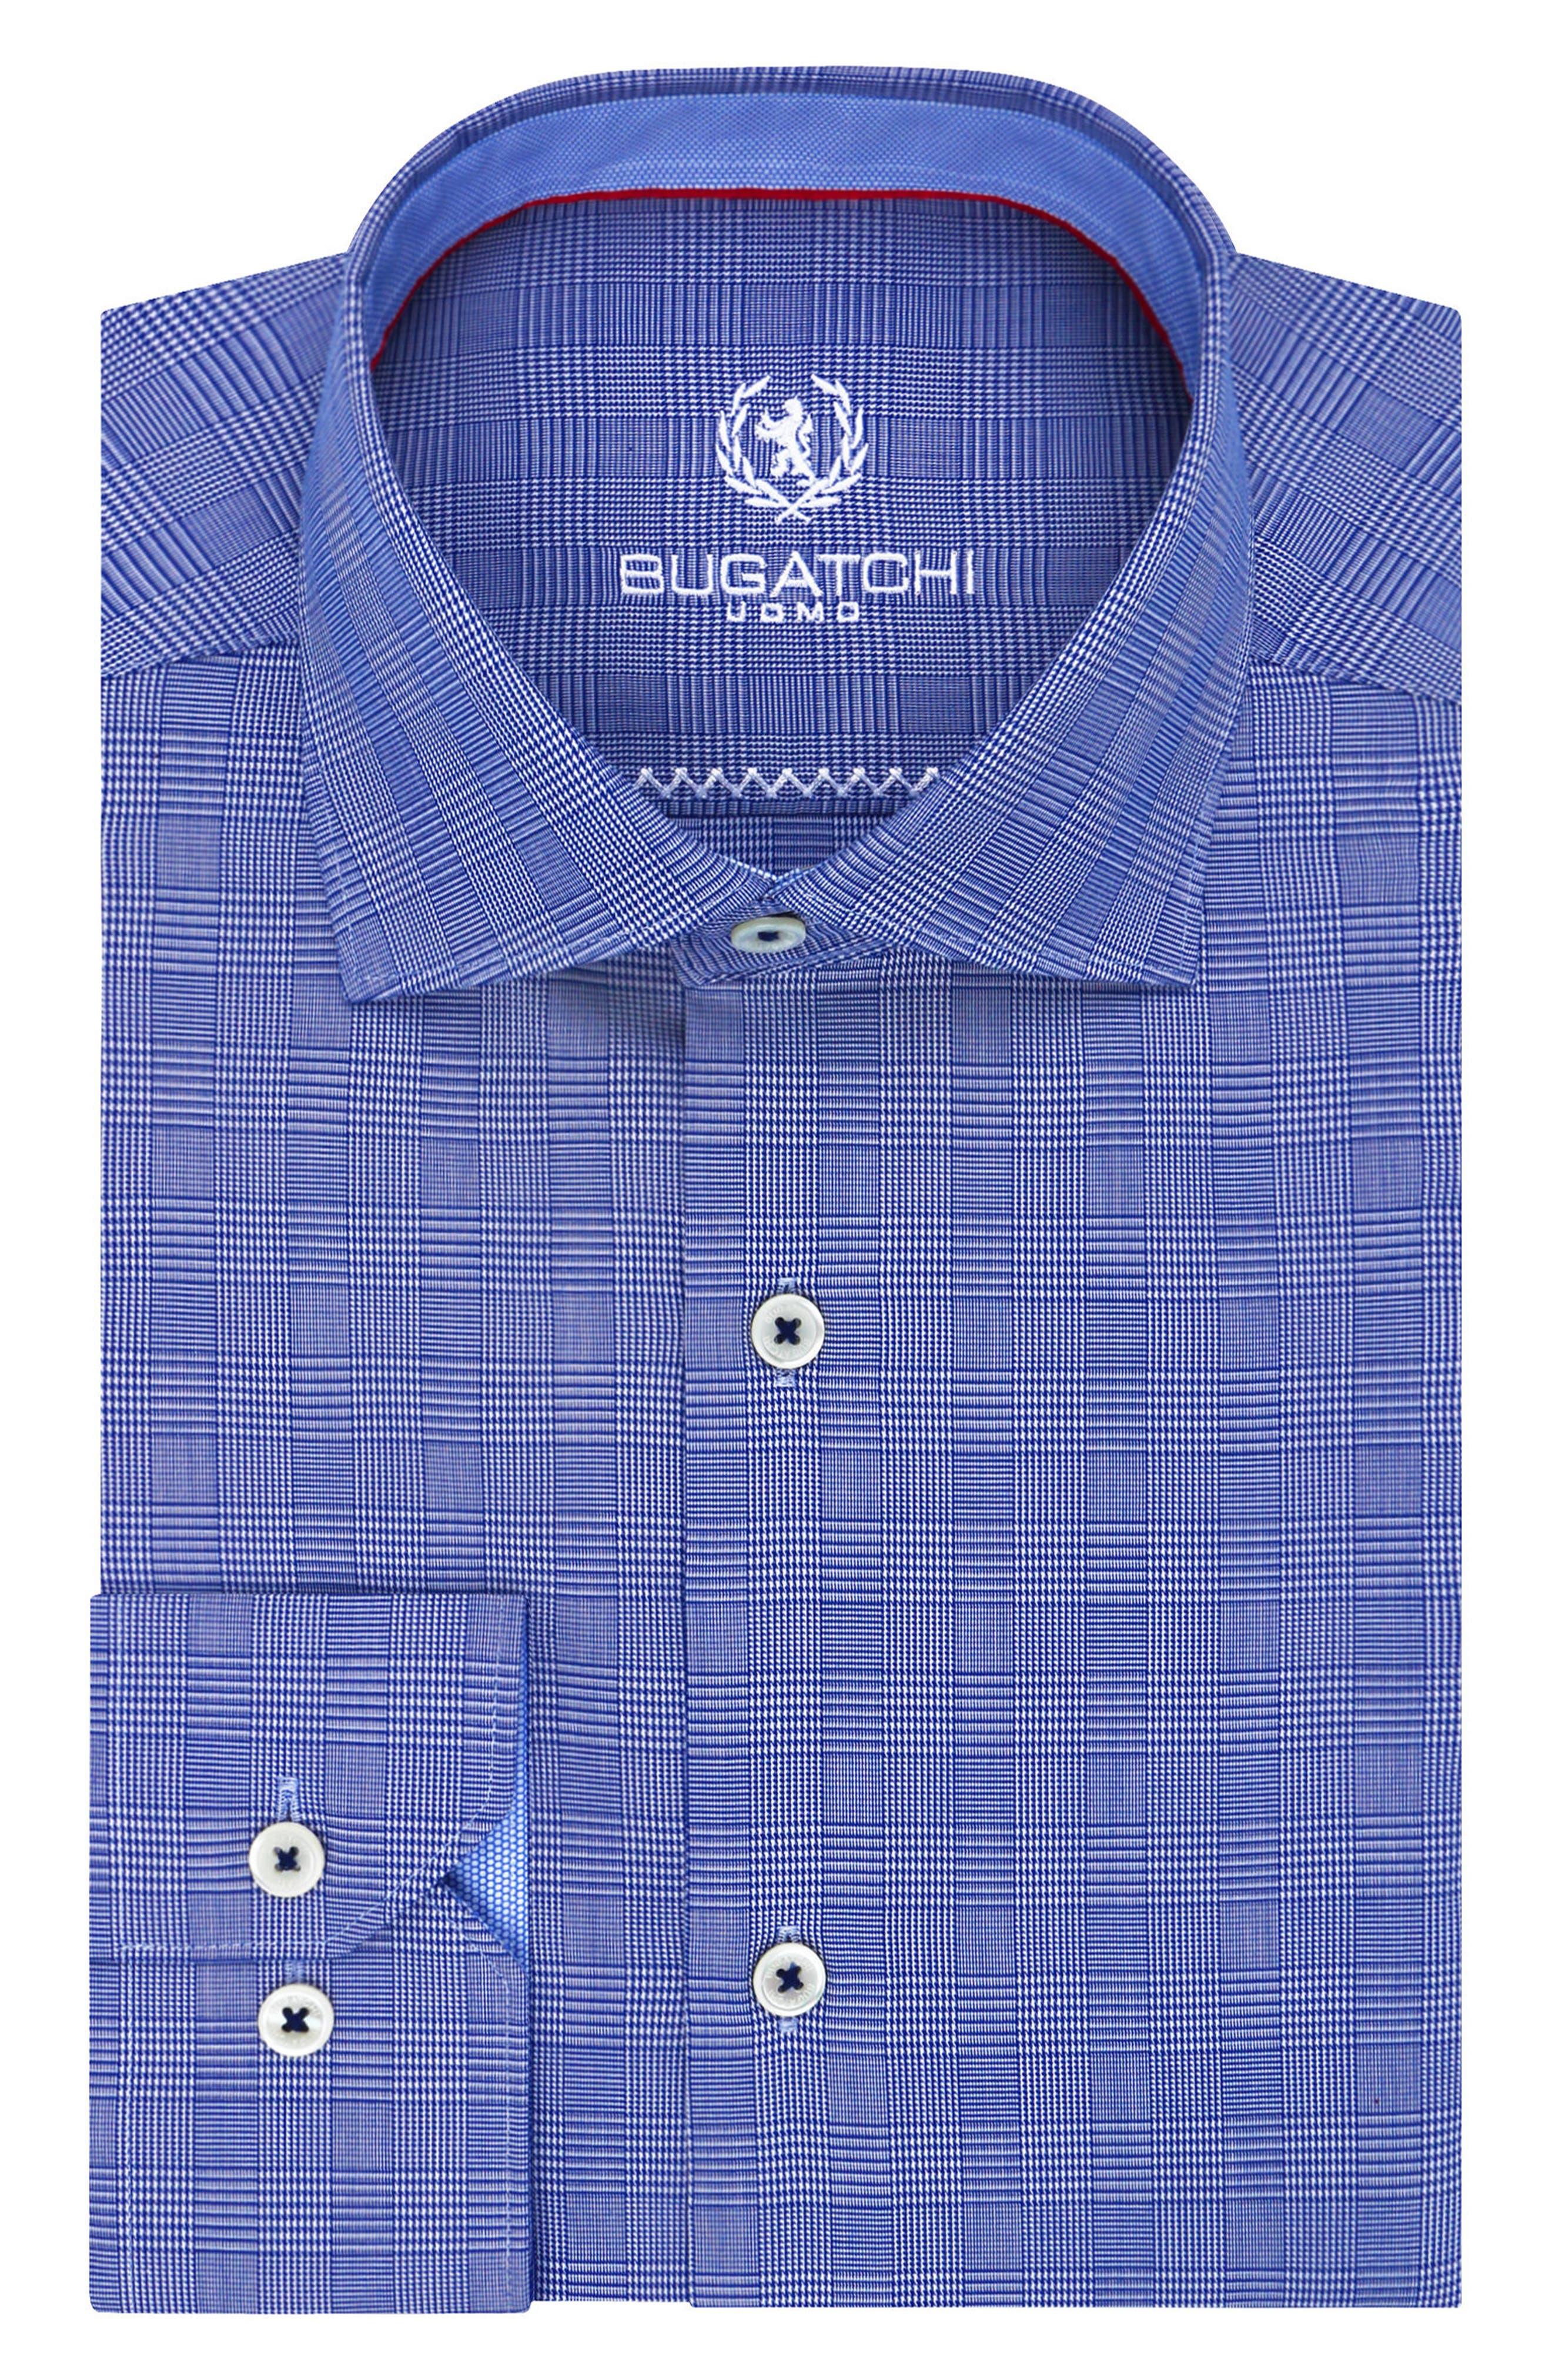 Alternate Image 1 Selected - Bugatchi Trim Fit Plaid Dress Shirt